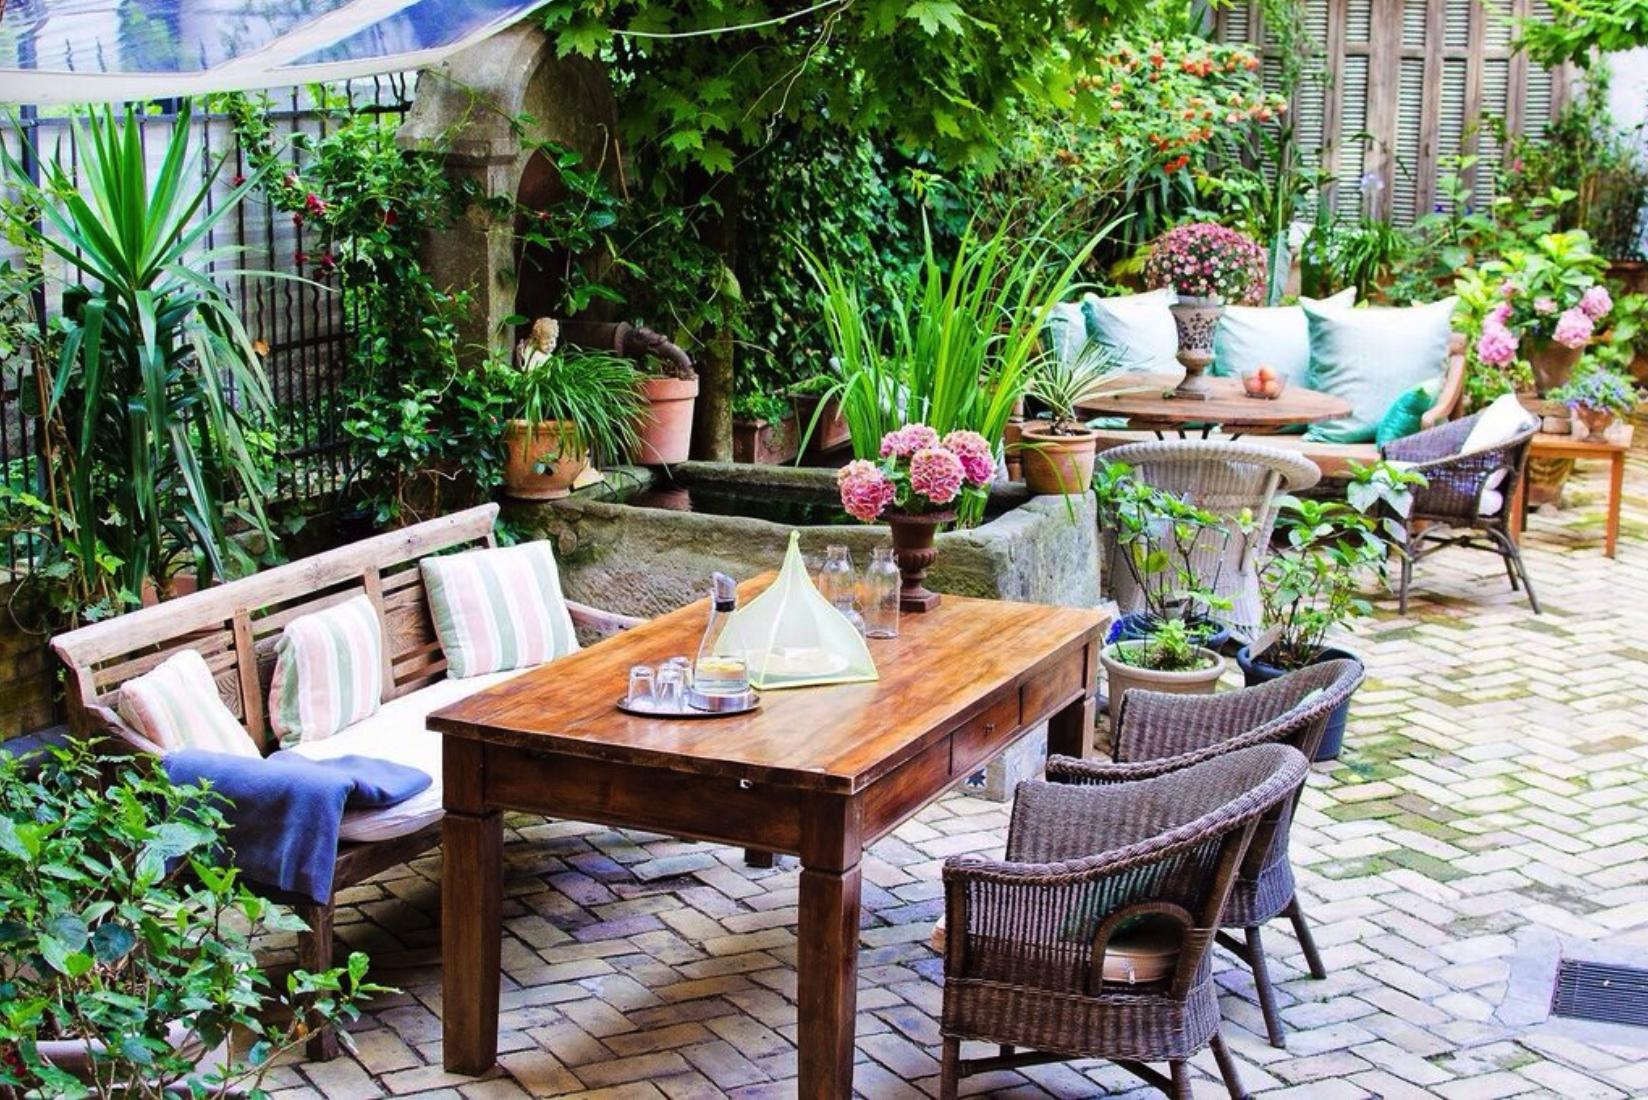 Courtyard Garden - Photo Courtesy of Ackselhaus